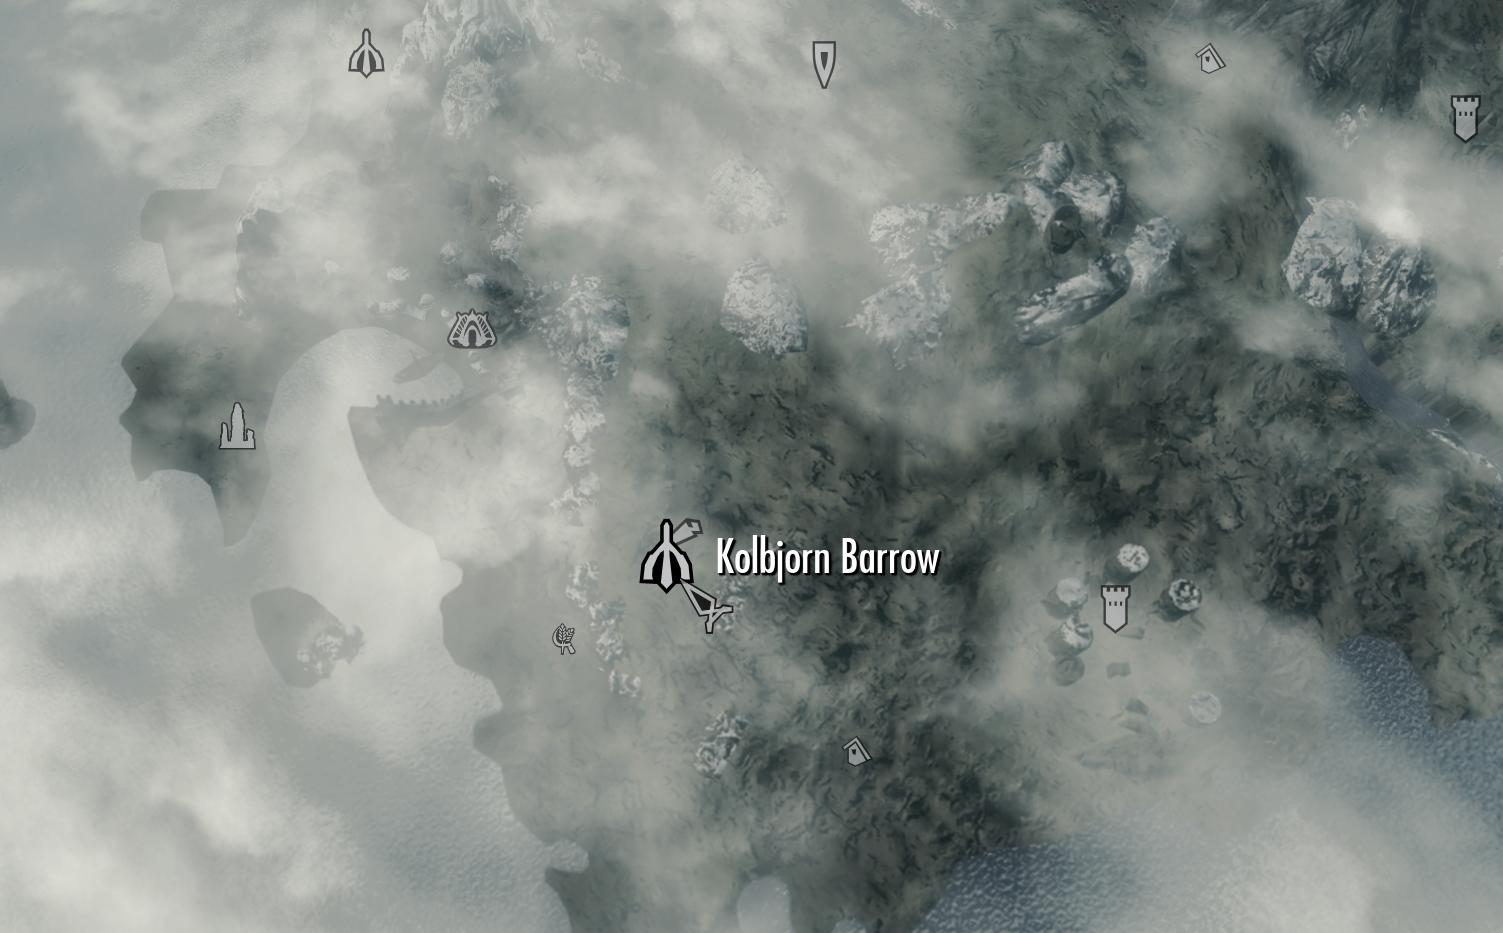 Skyrim Dragonborn Map Location Solstheim